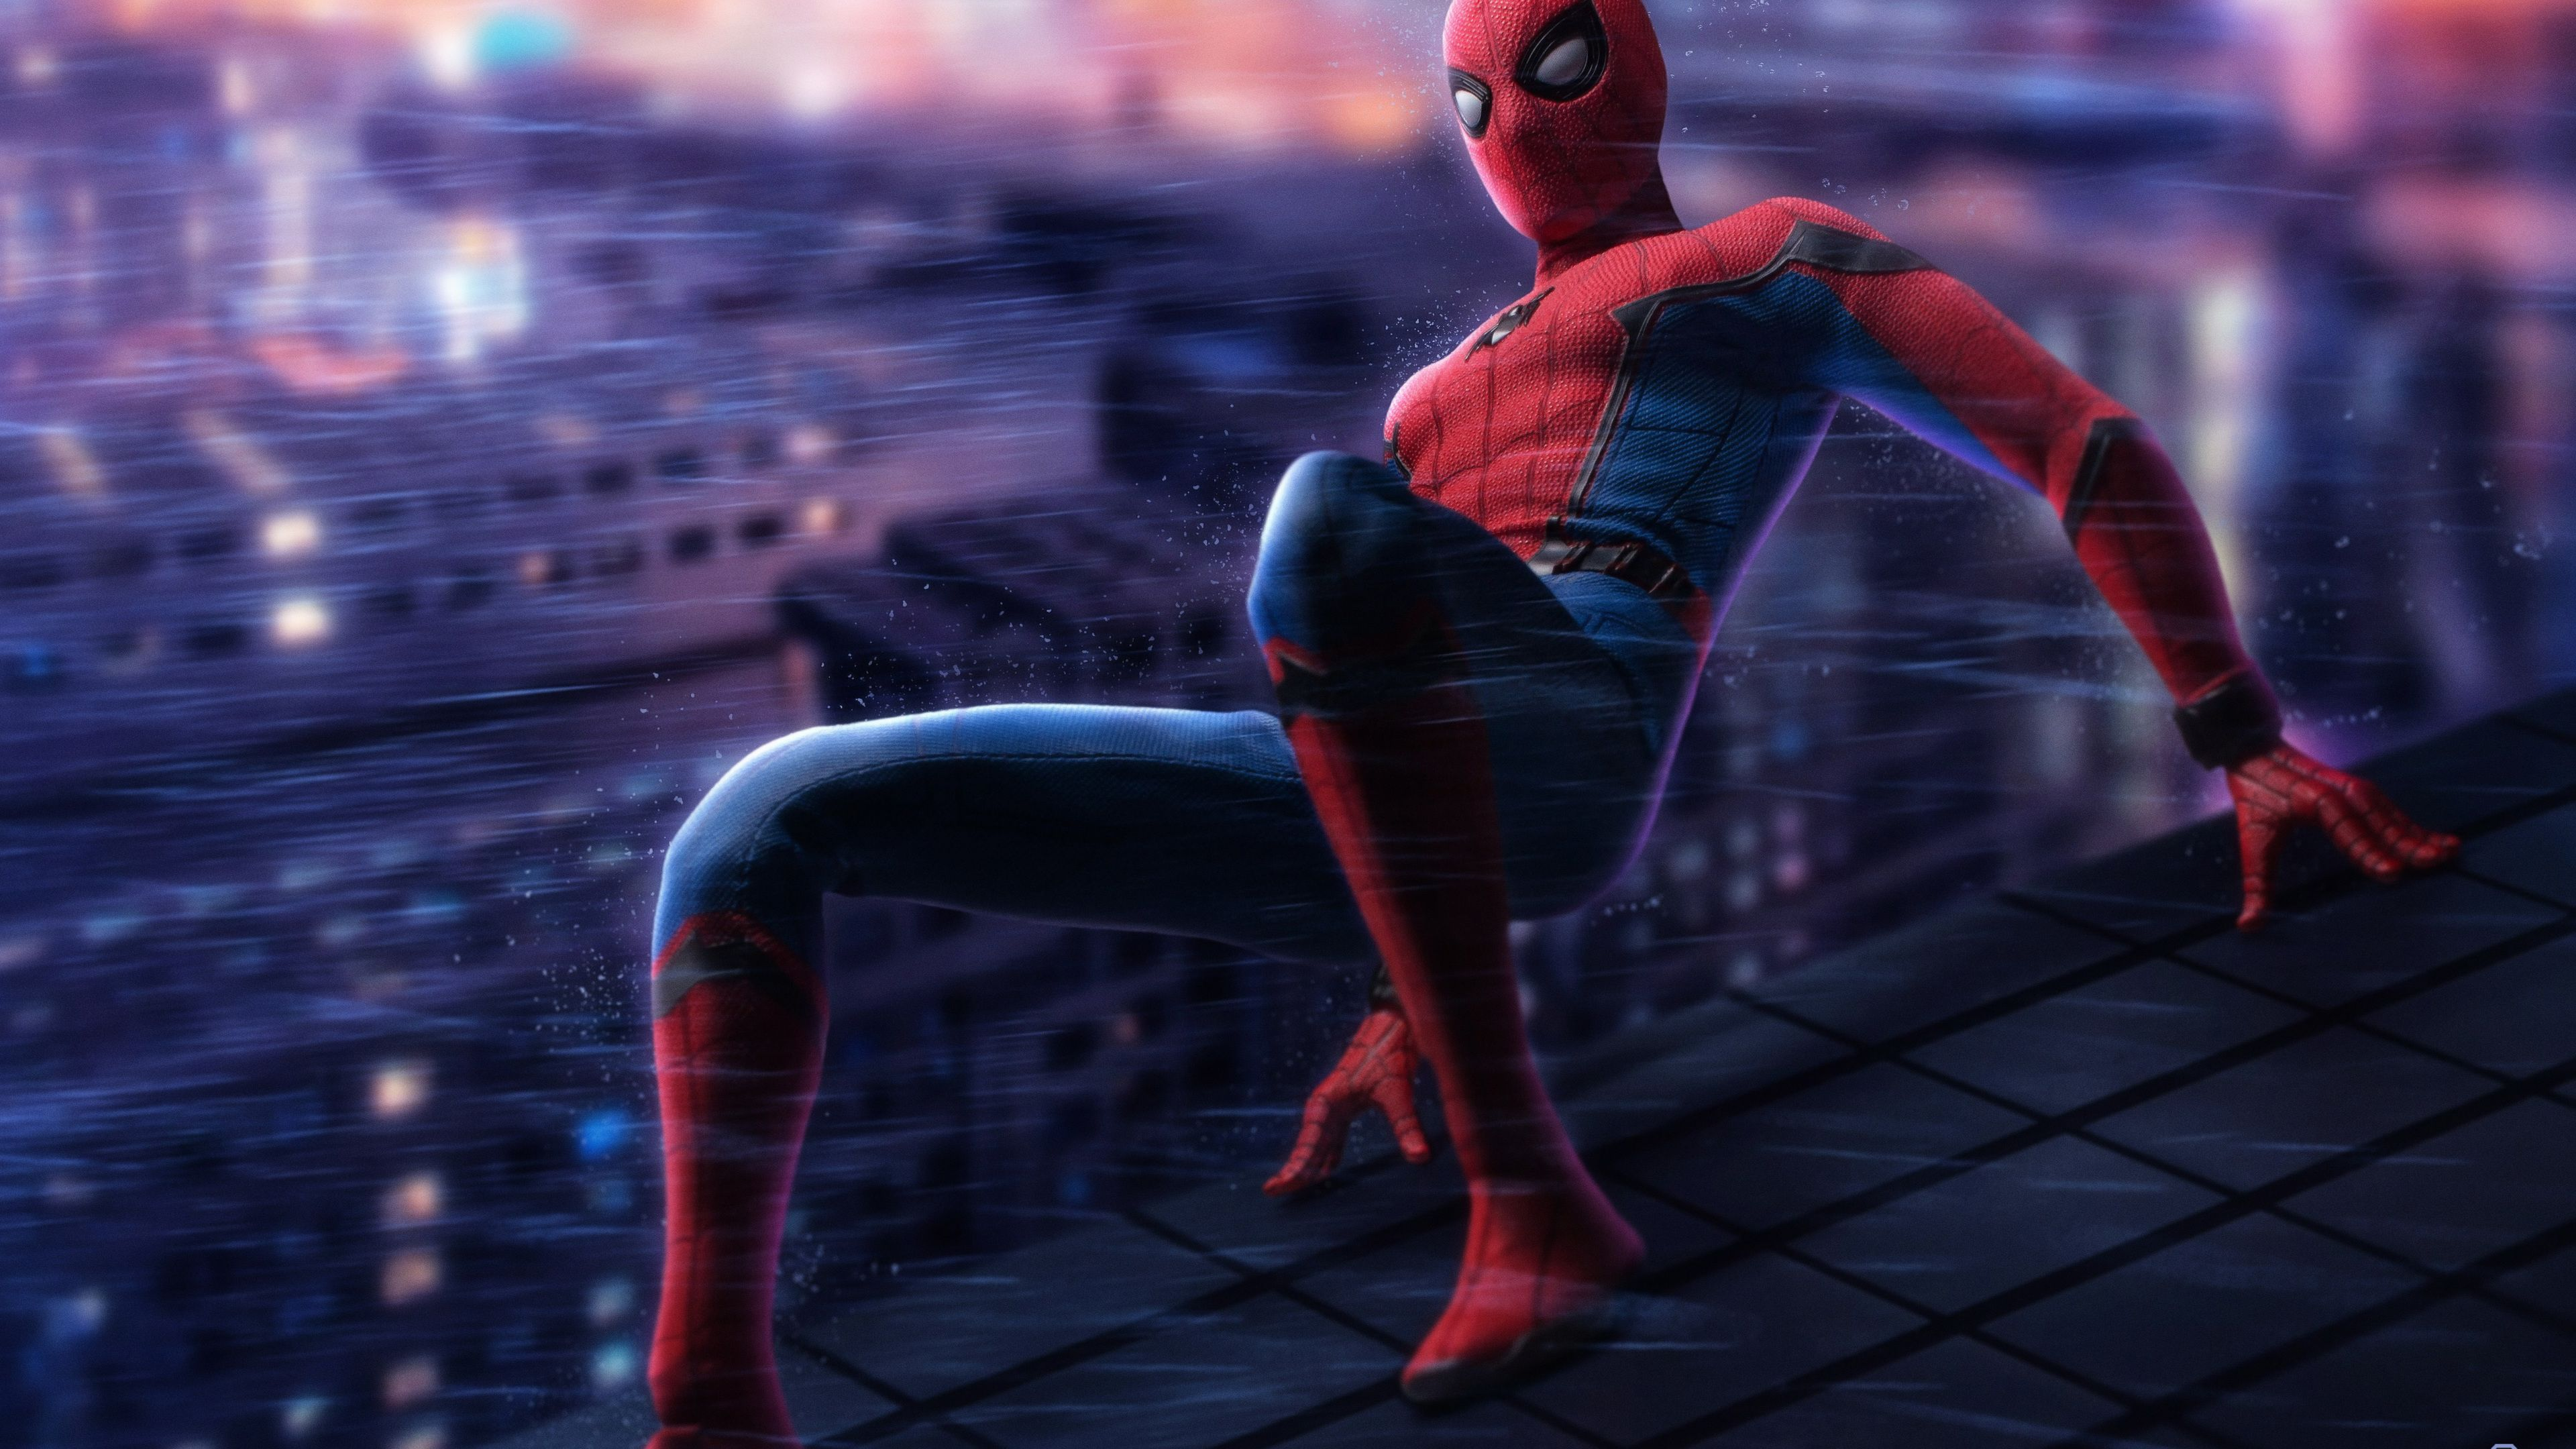 26+ Spider man wallpaper cool Download